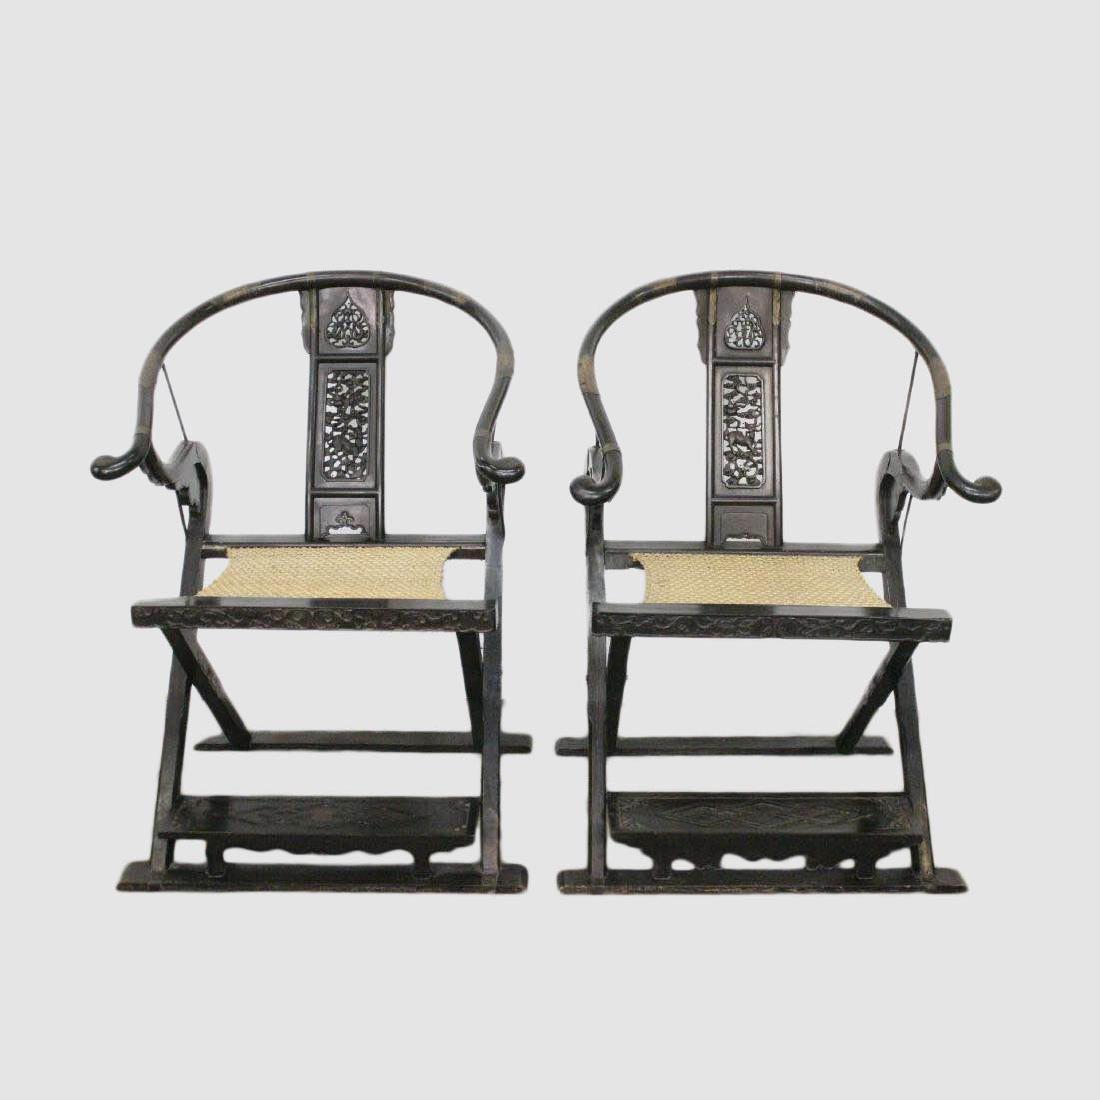 Very Old JiangJun Chairs Pair